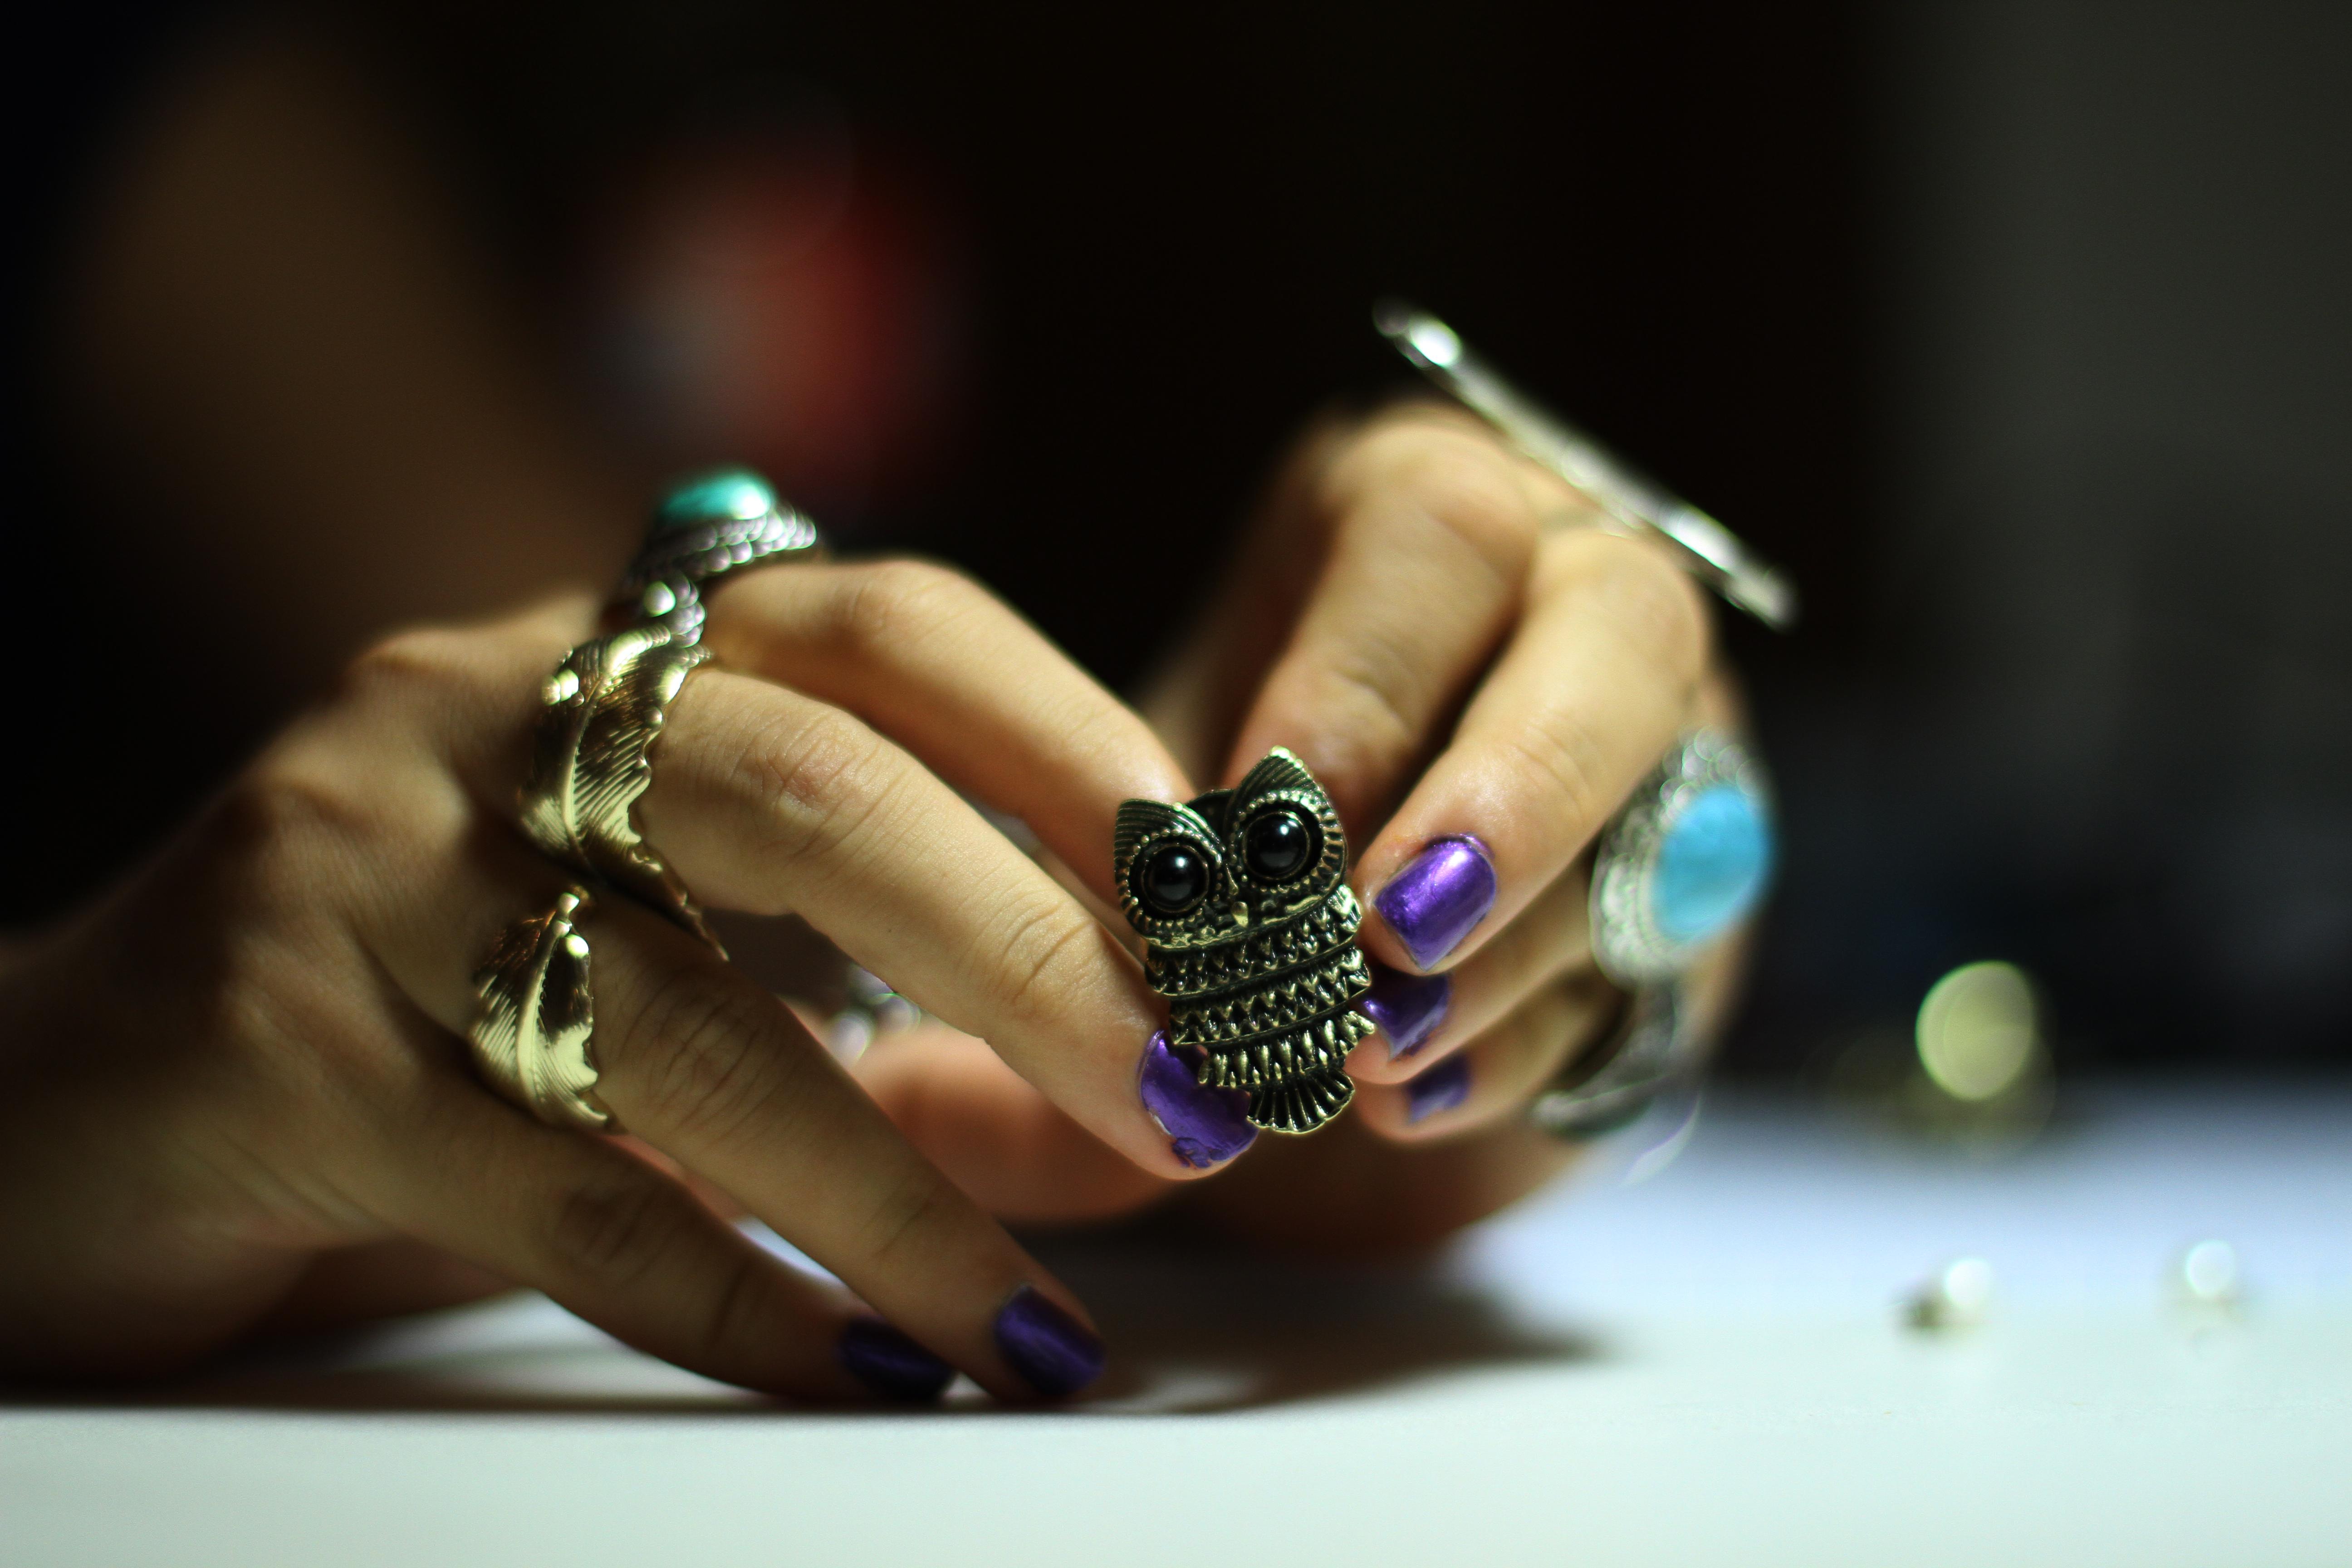 Wallpaper : hands, rings, owl, TV, Polish, nails, Friends, cool ...